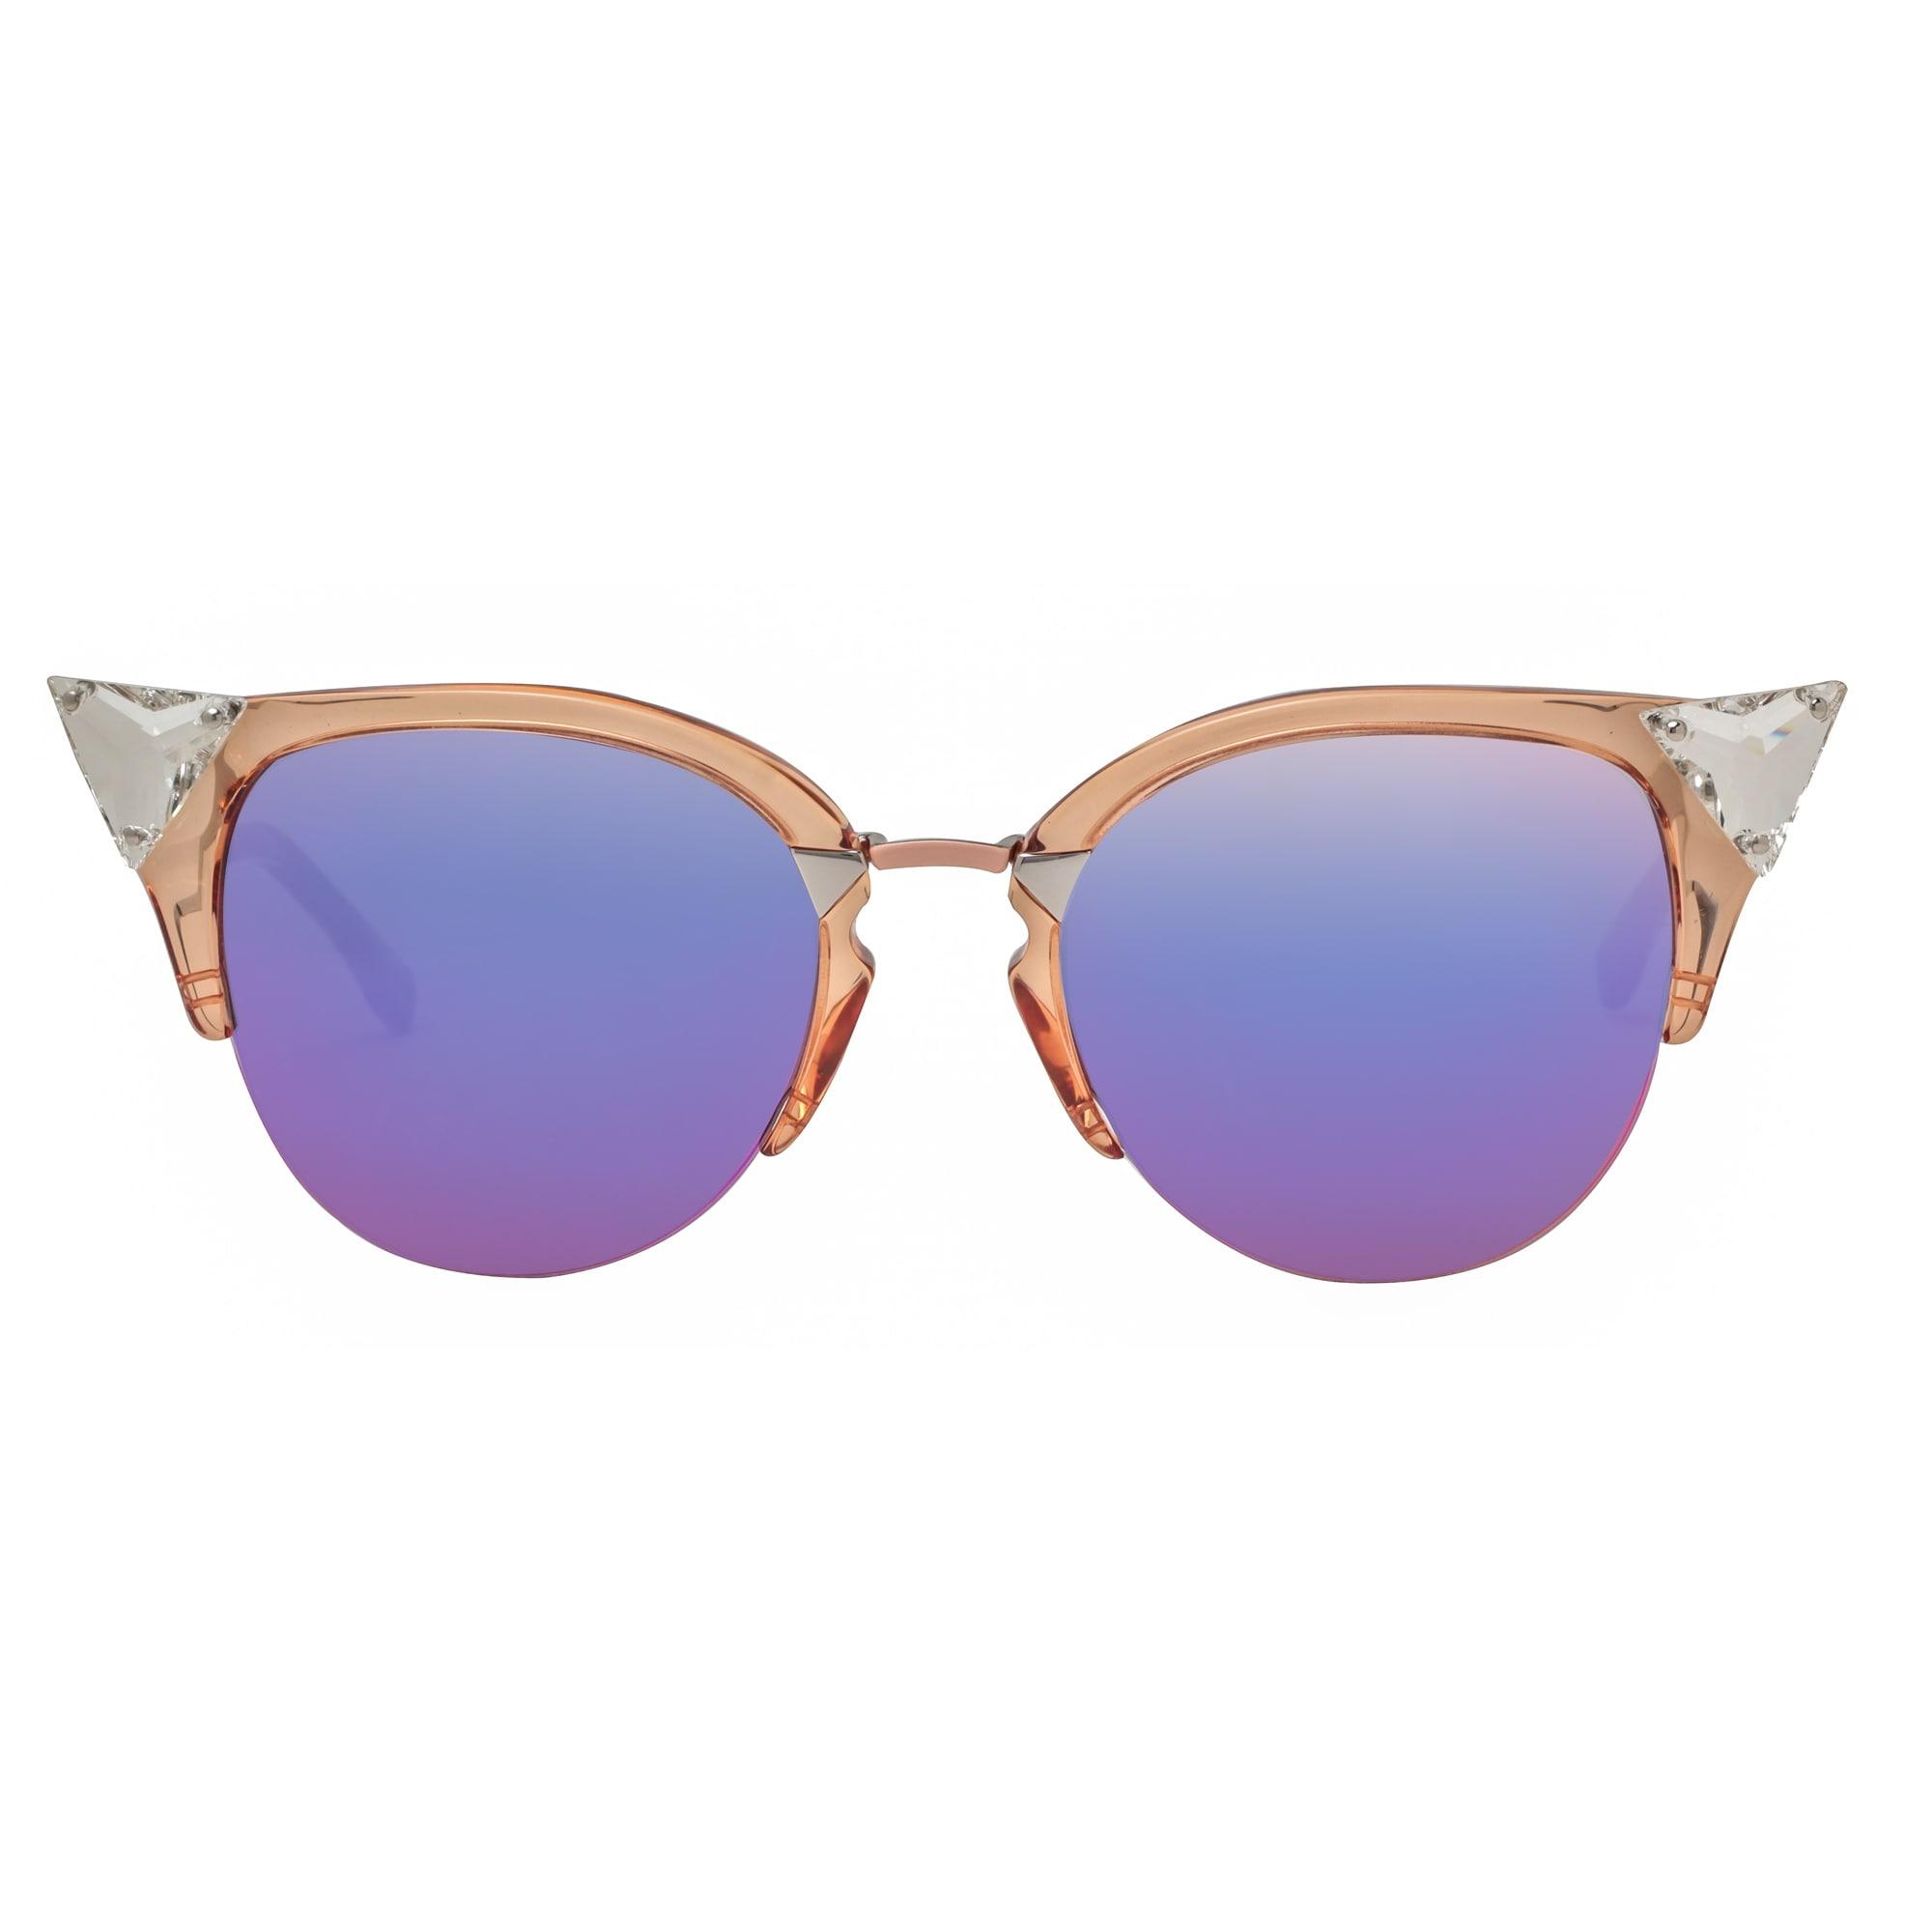 d2320bae82f3 Shop Fendi FF 0041 S 9F6 VQ Iridia Transparent Peach Women s Cat Eye  Sunglasses - transparent peach - 52mm-20mm-135mm - Free Shipping Today -  Overstock - ...